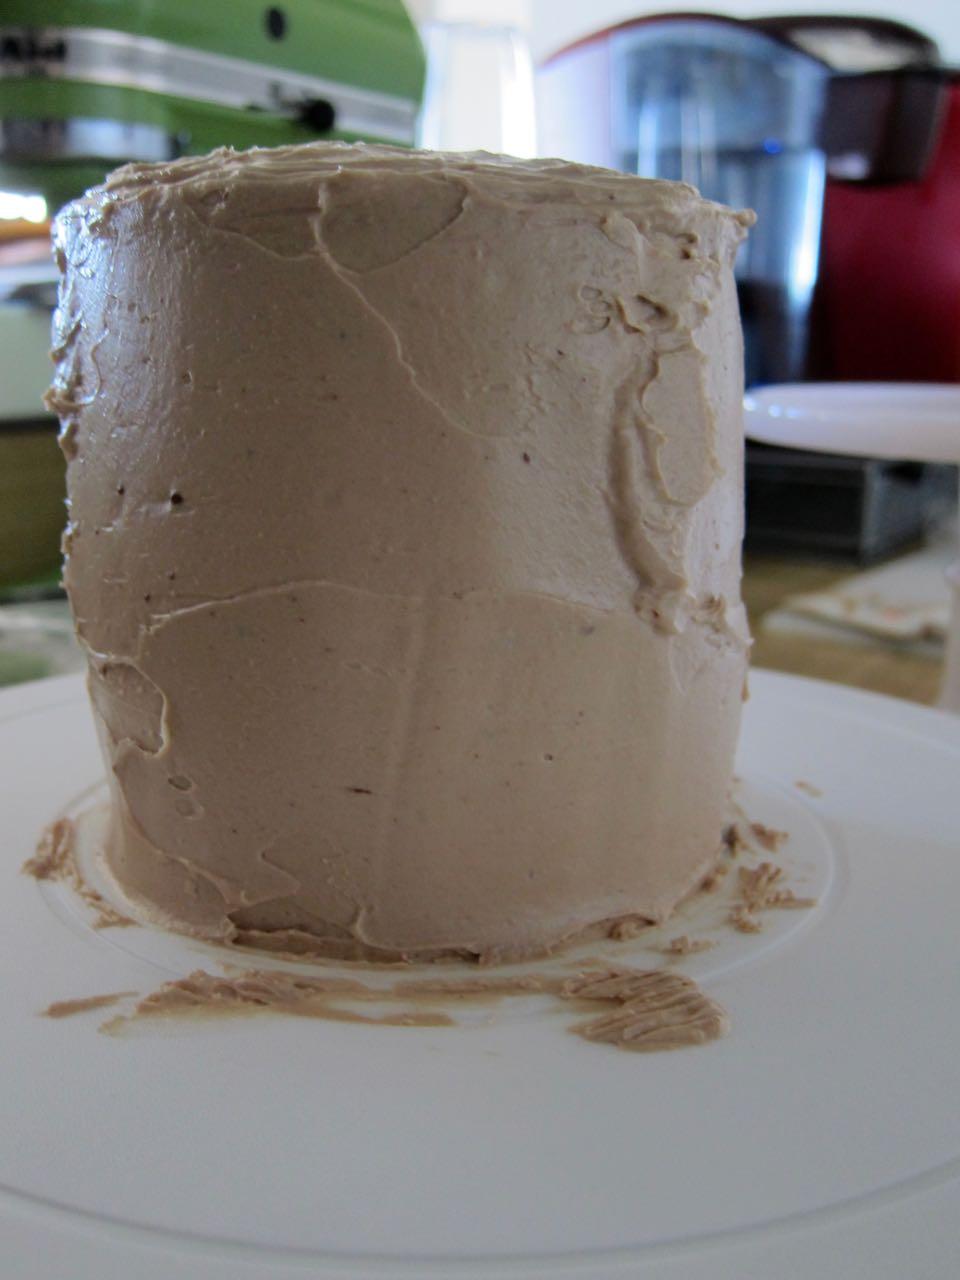 tahini chocolate frosted cake.jpg